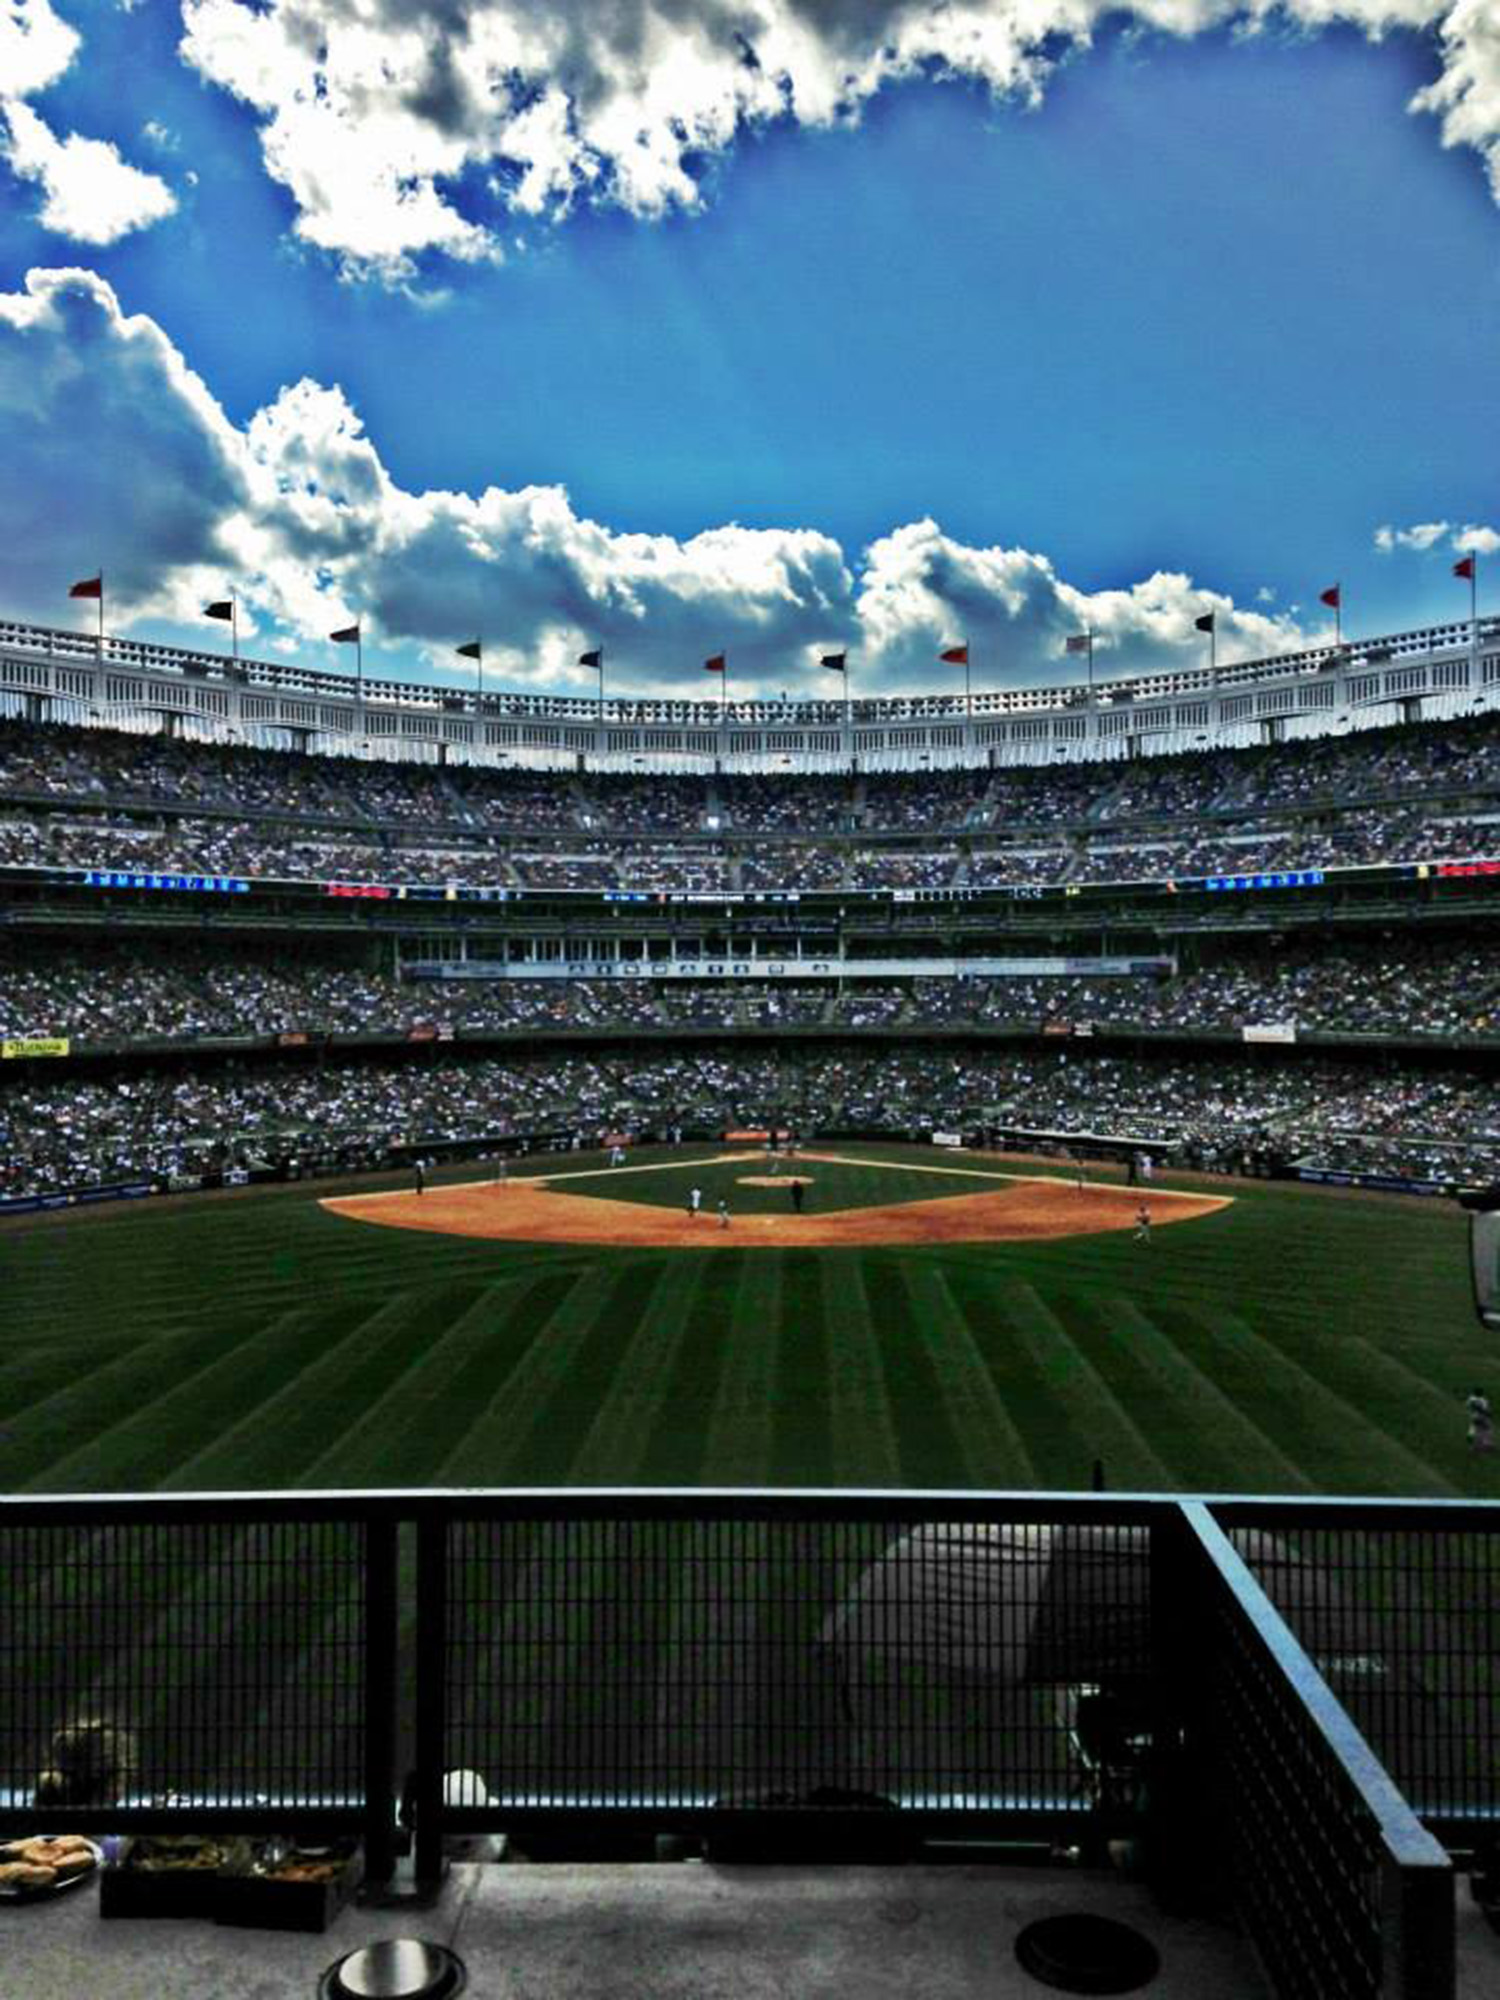 A baseball stadium full of spectators